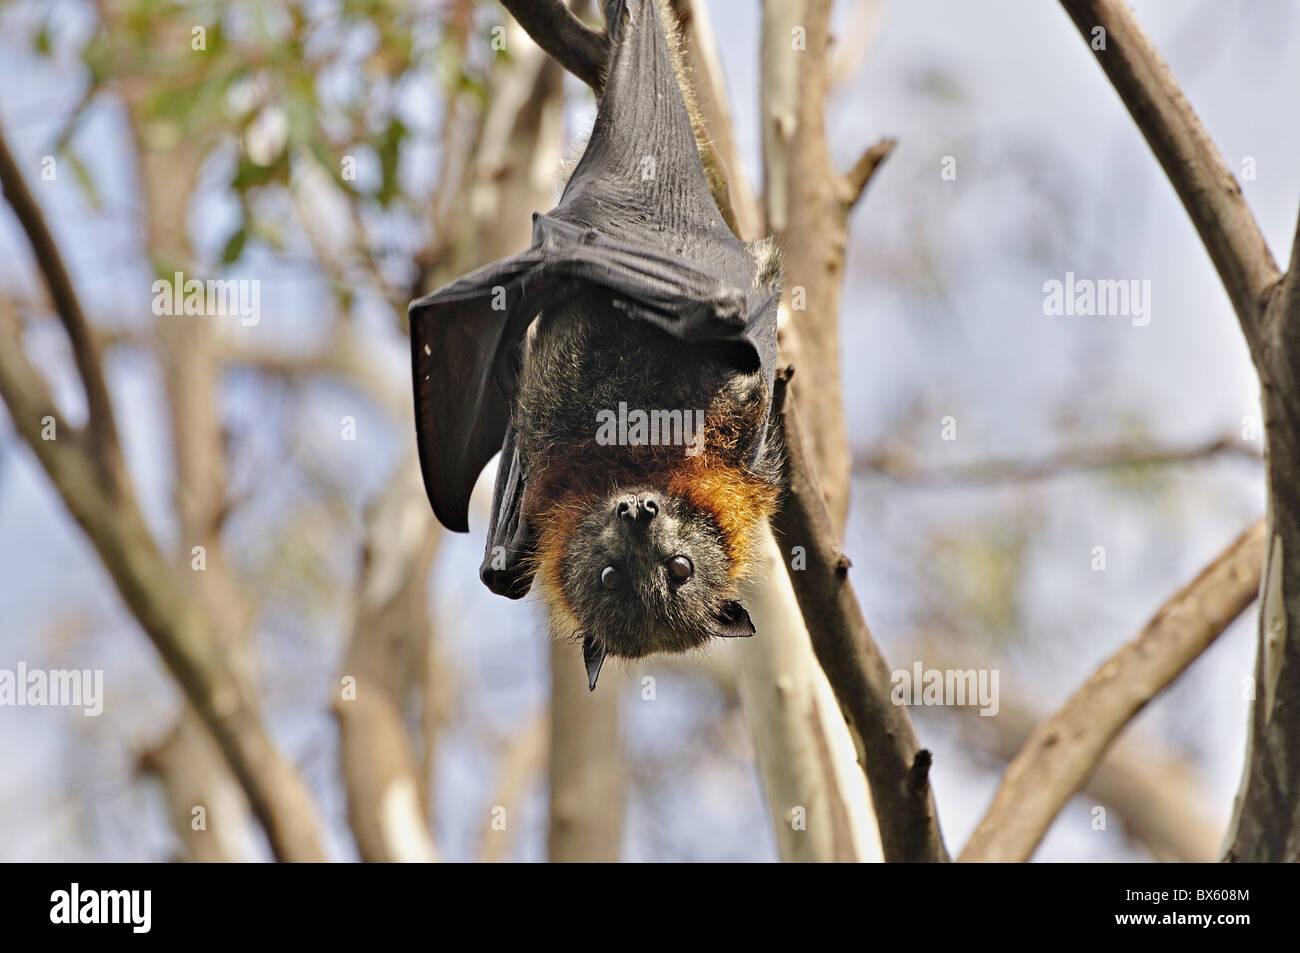 A testa grigia flying fox (Pteropus poliocephalus), piegare Yarra Park, Melbourne, Victoria, Australia Pacific Foto Stock